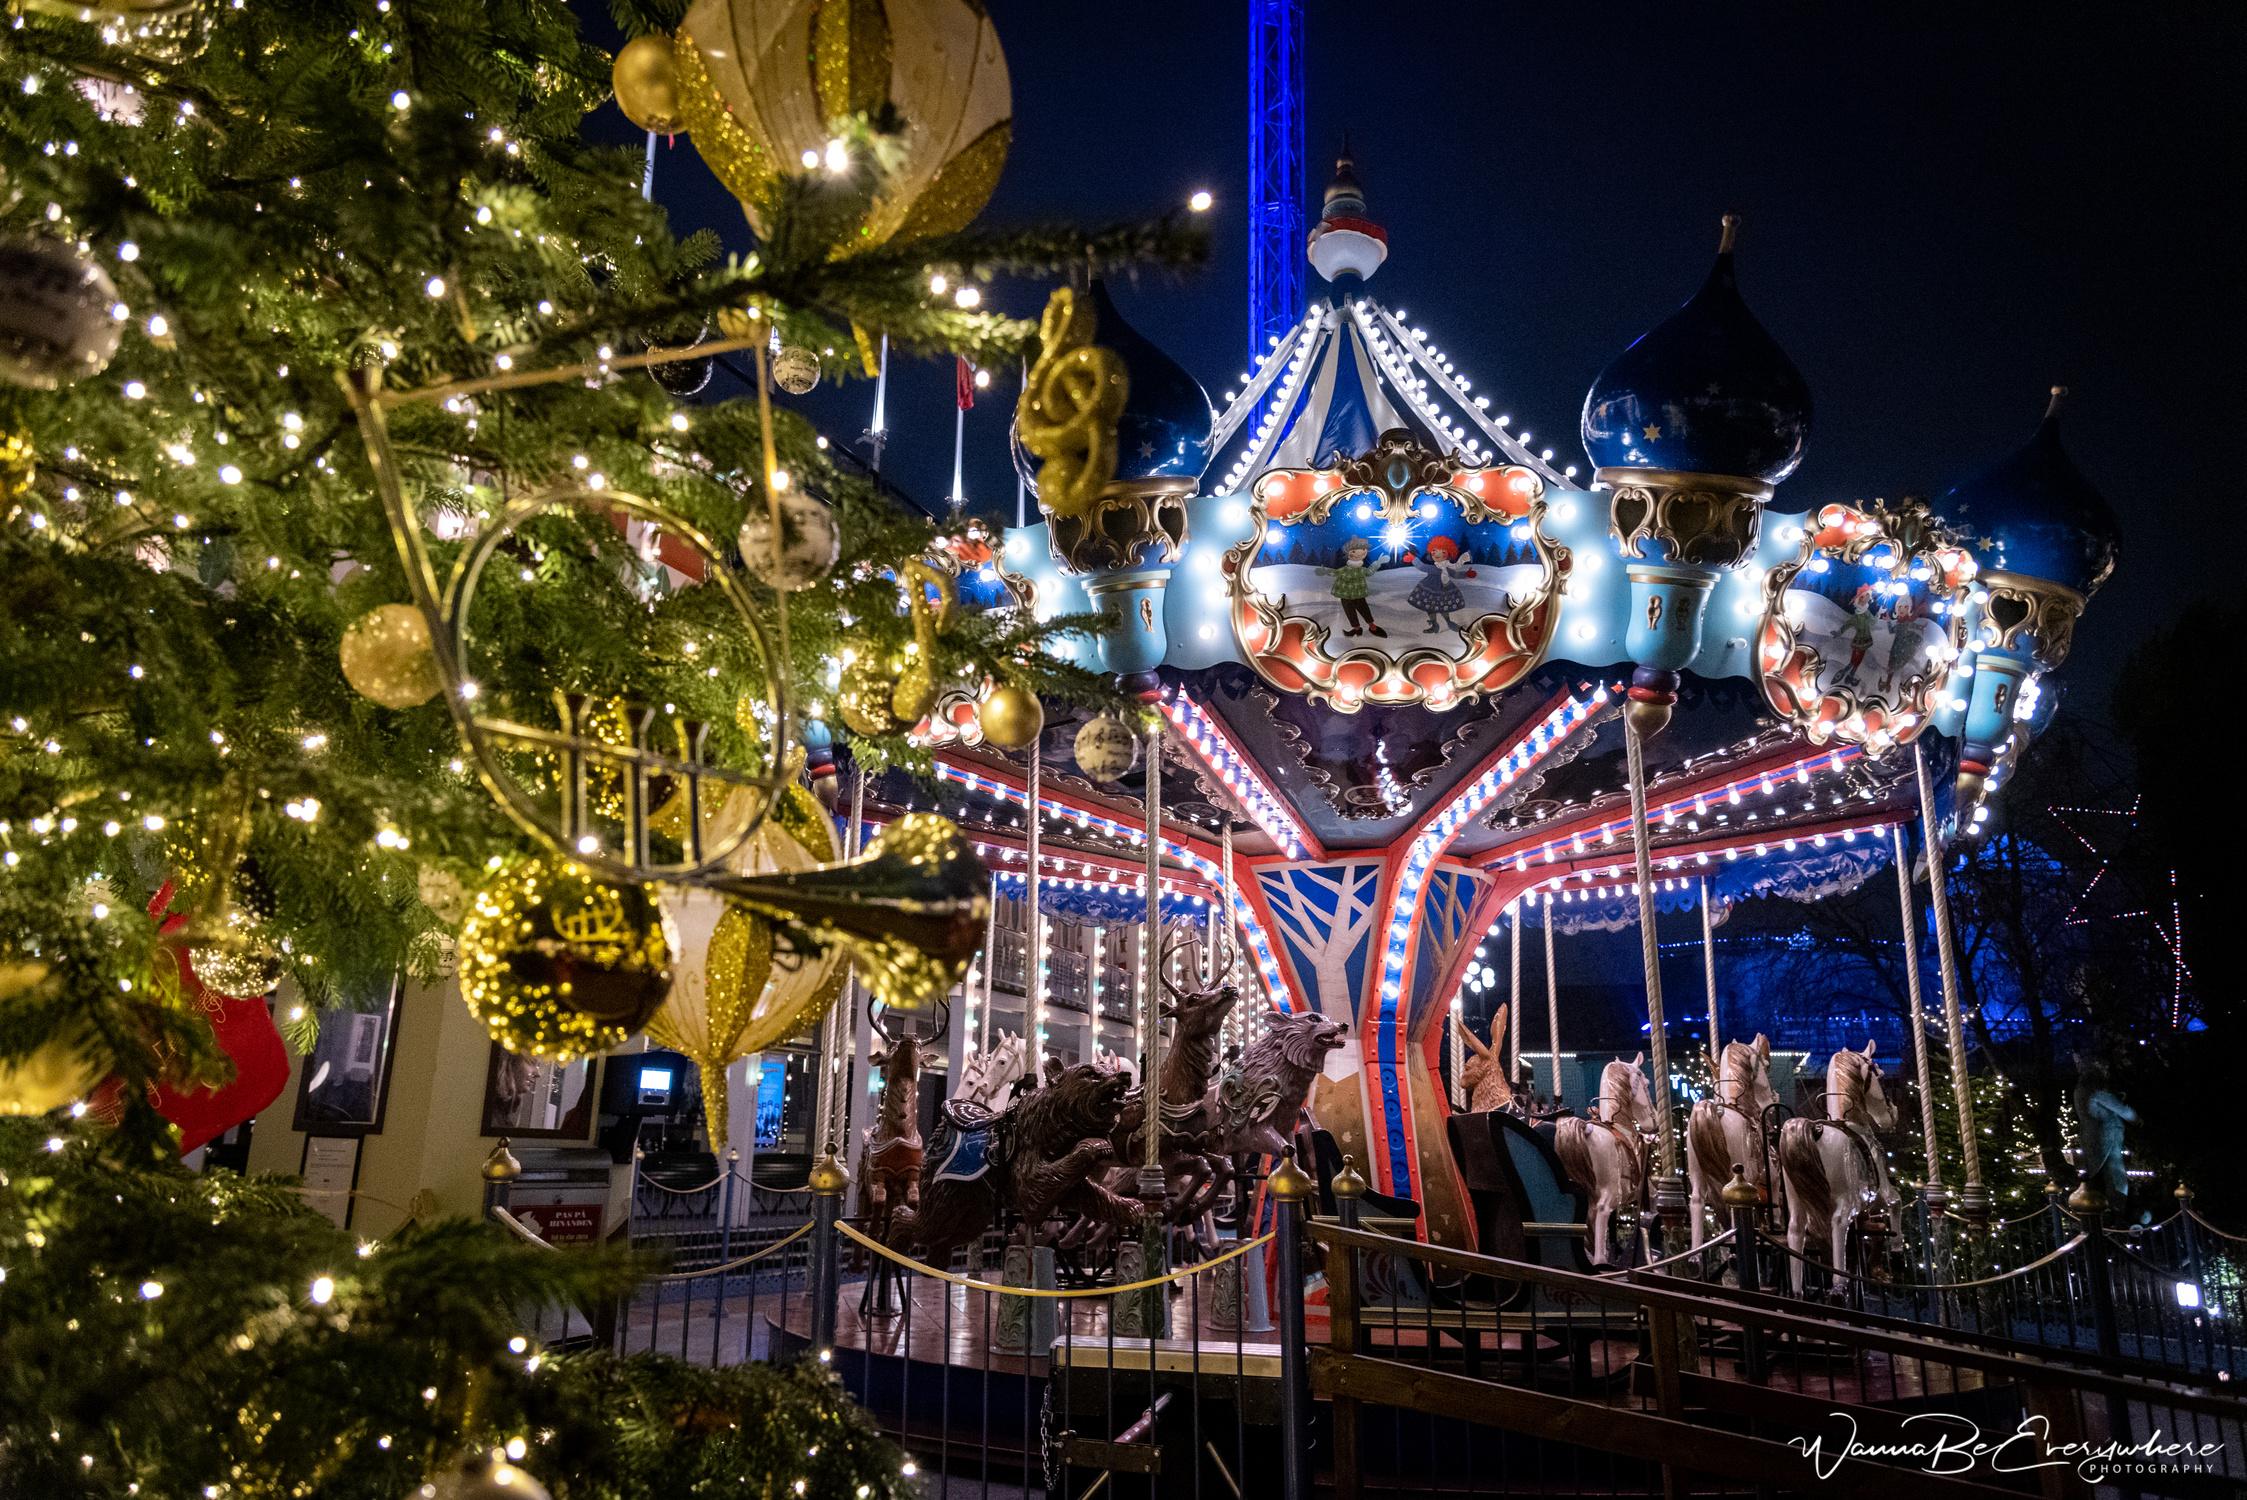 Tivoli during Christmas, Denmark